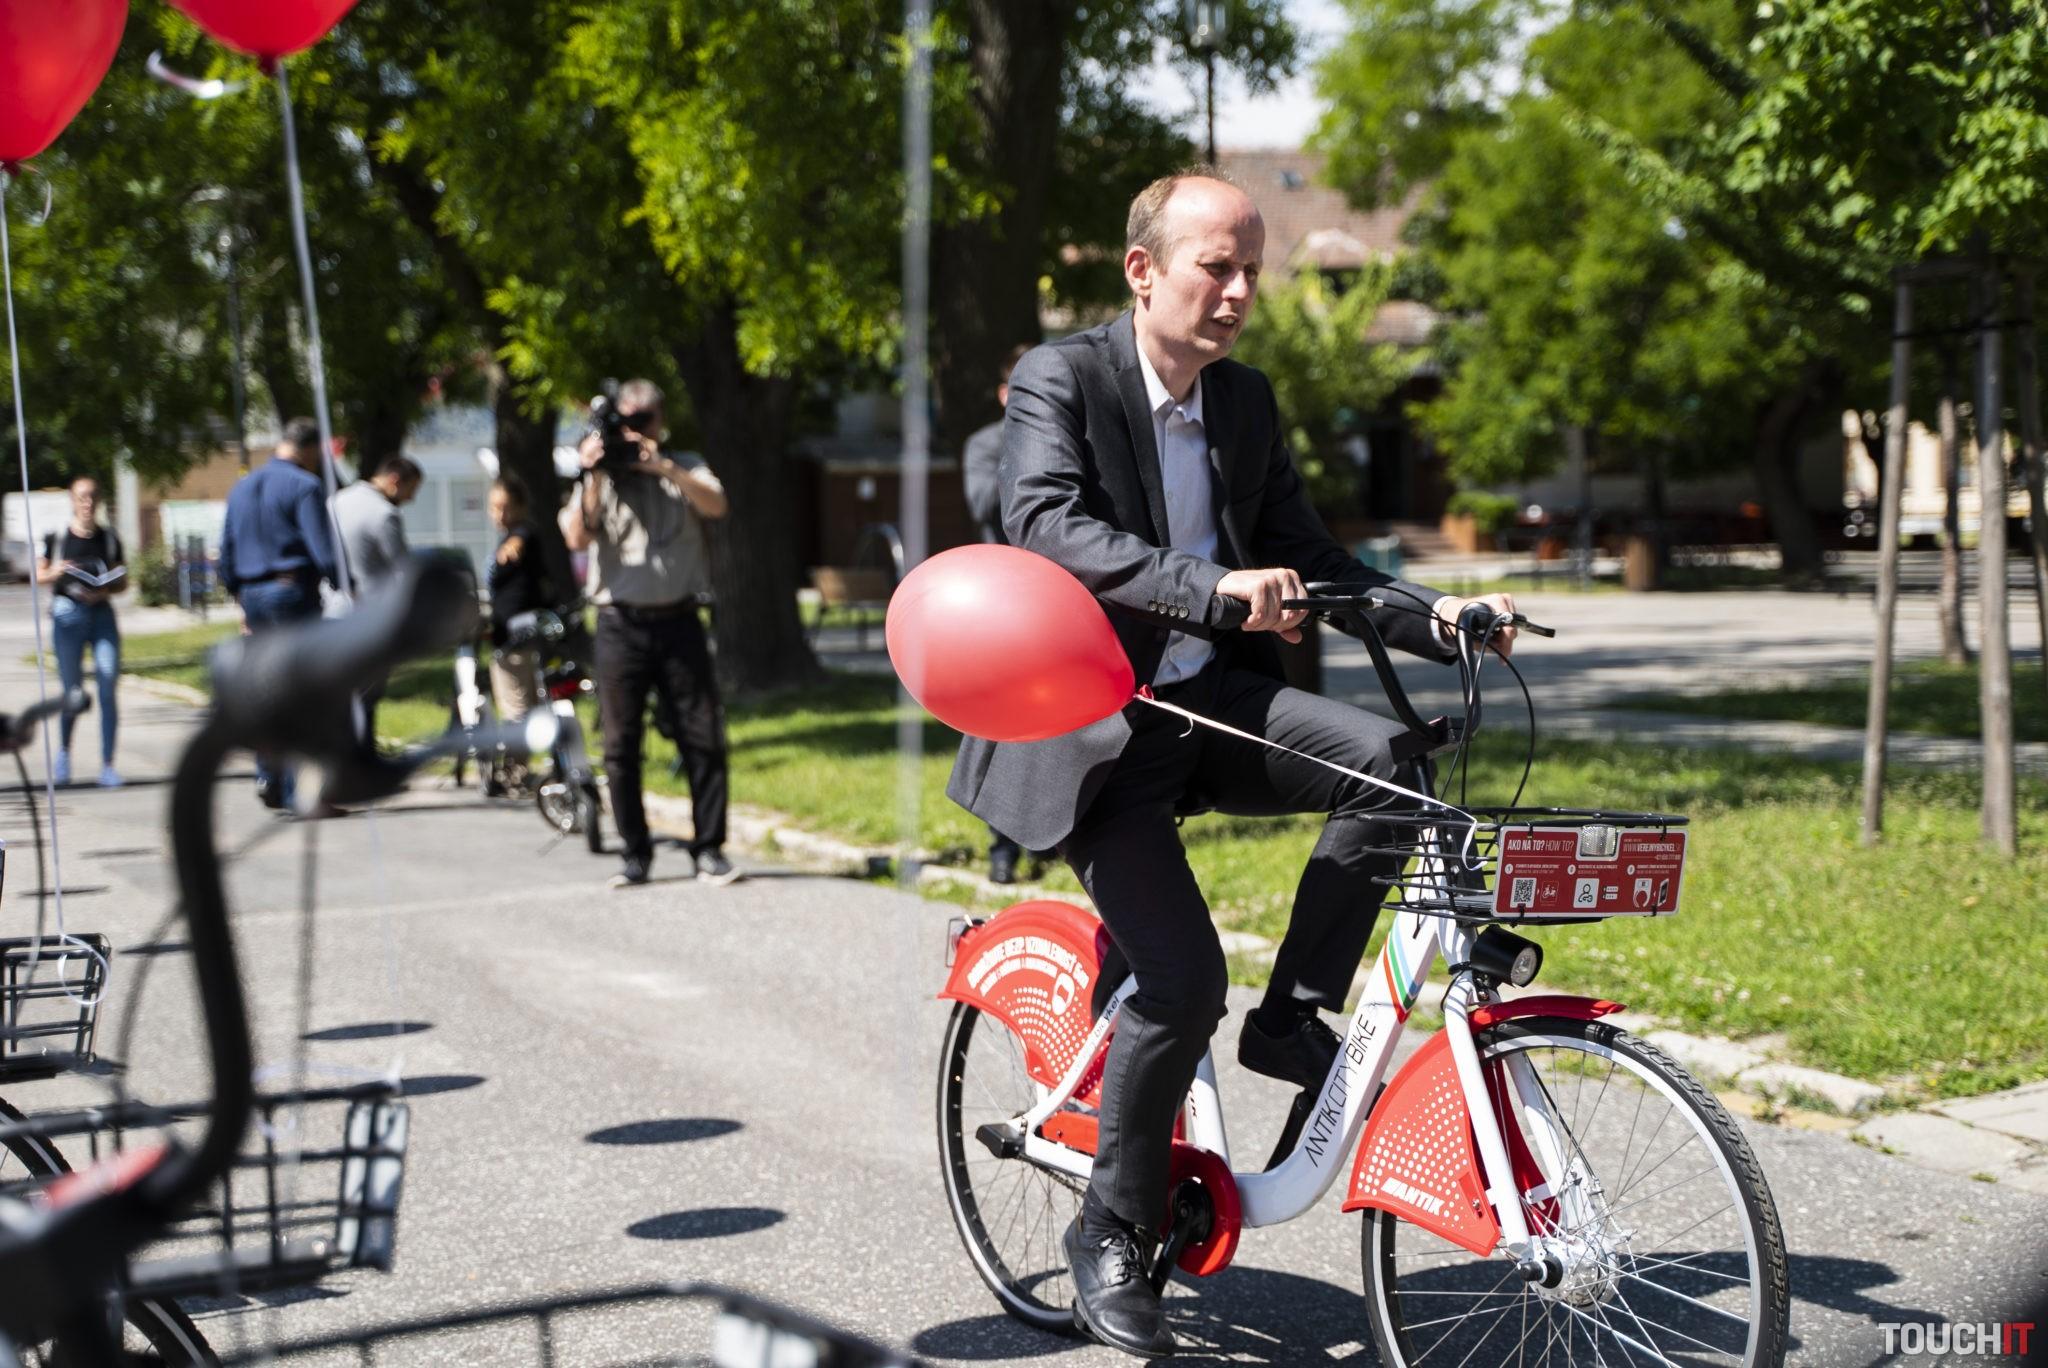 Peter Blaas si bicykel vo Vajnoroch hneď vyskúšal